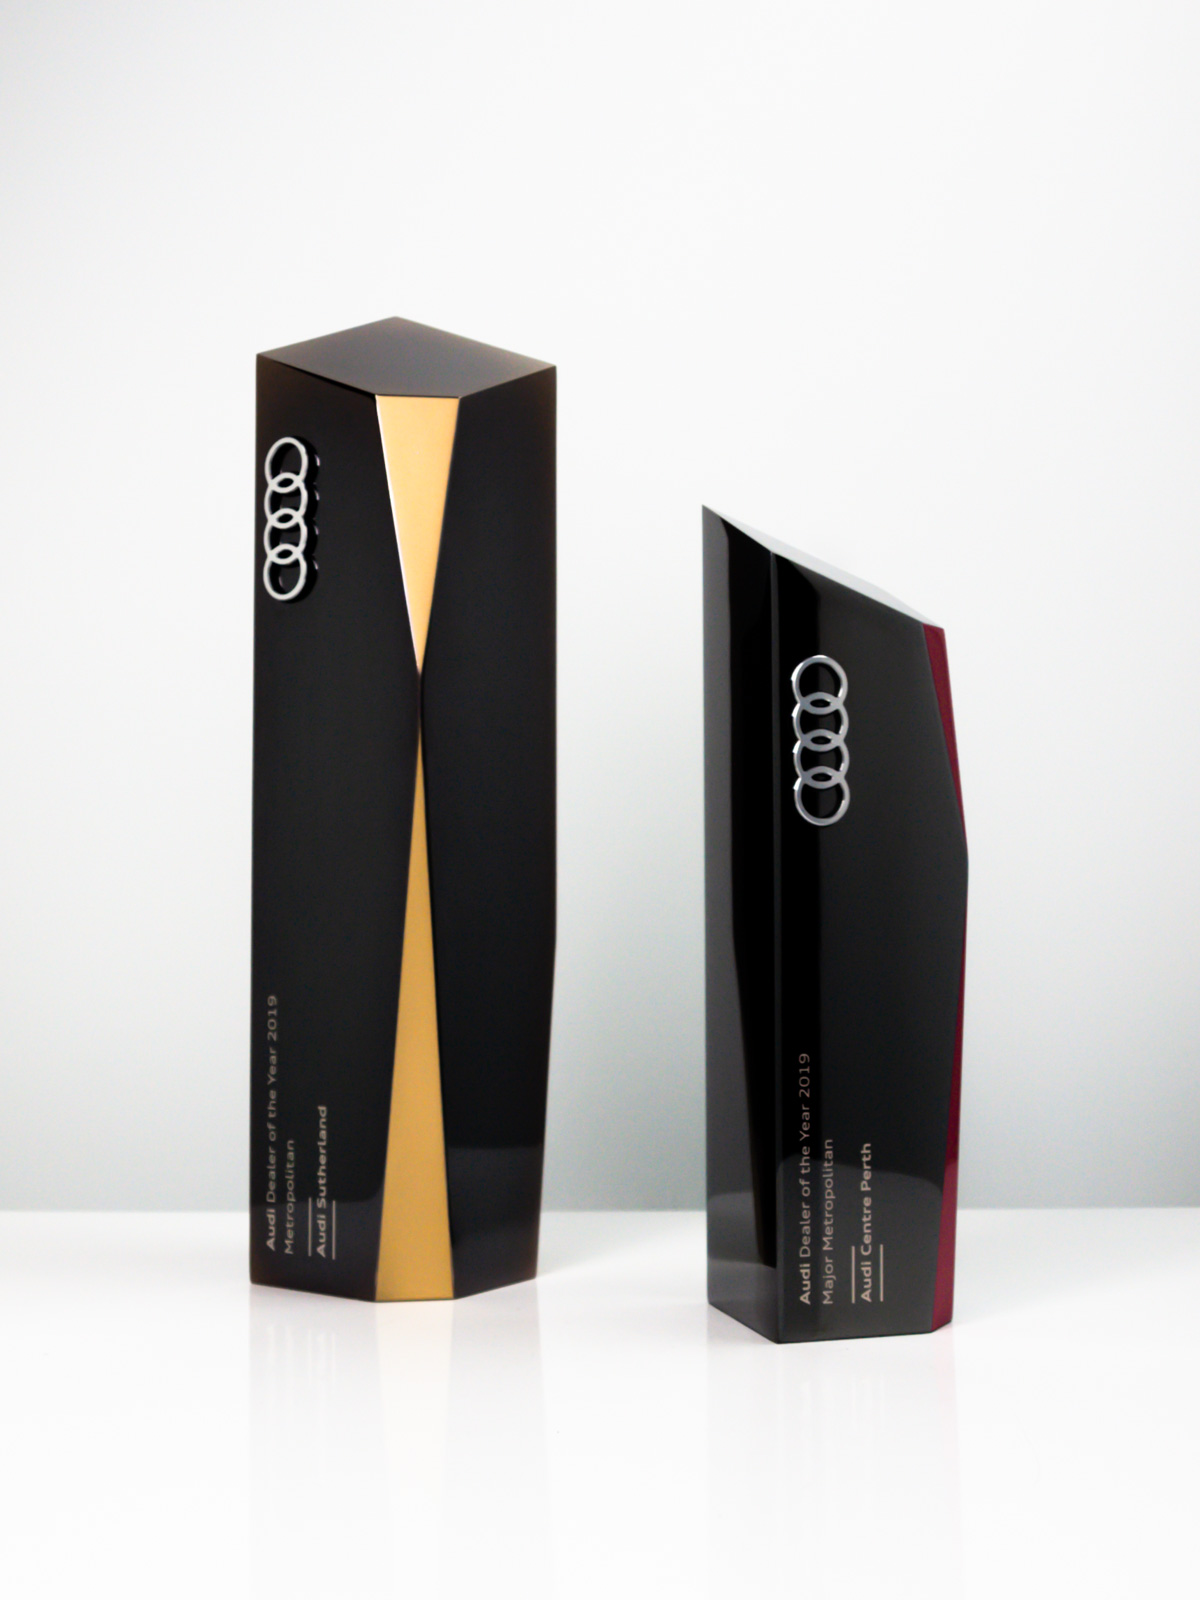 Audi Dealer of the Year Bespoke Awards